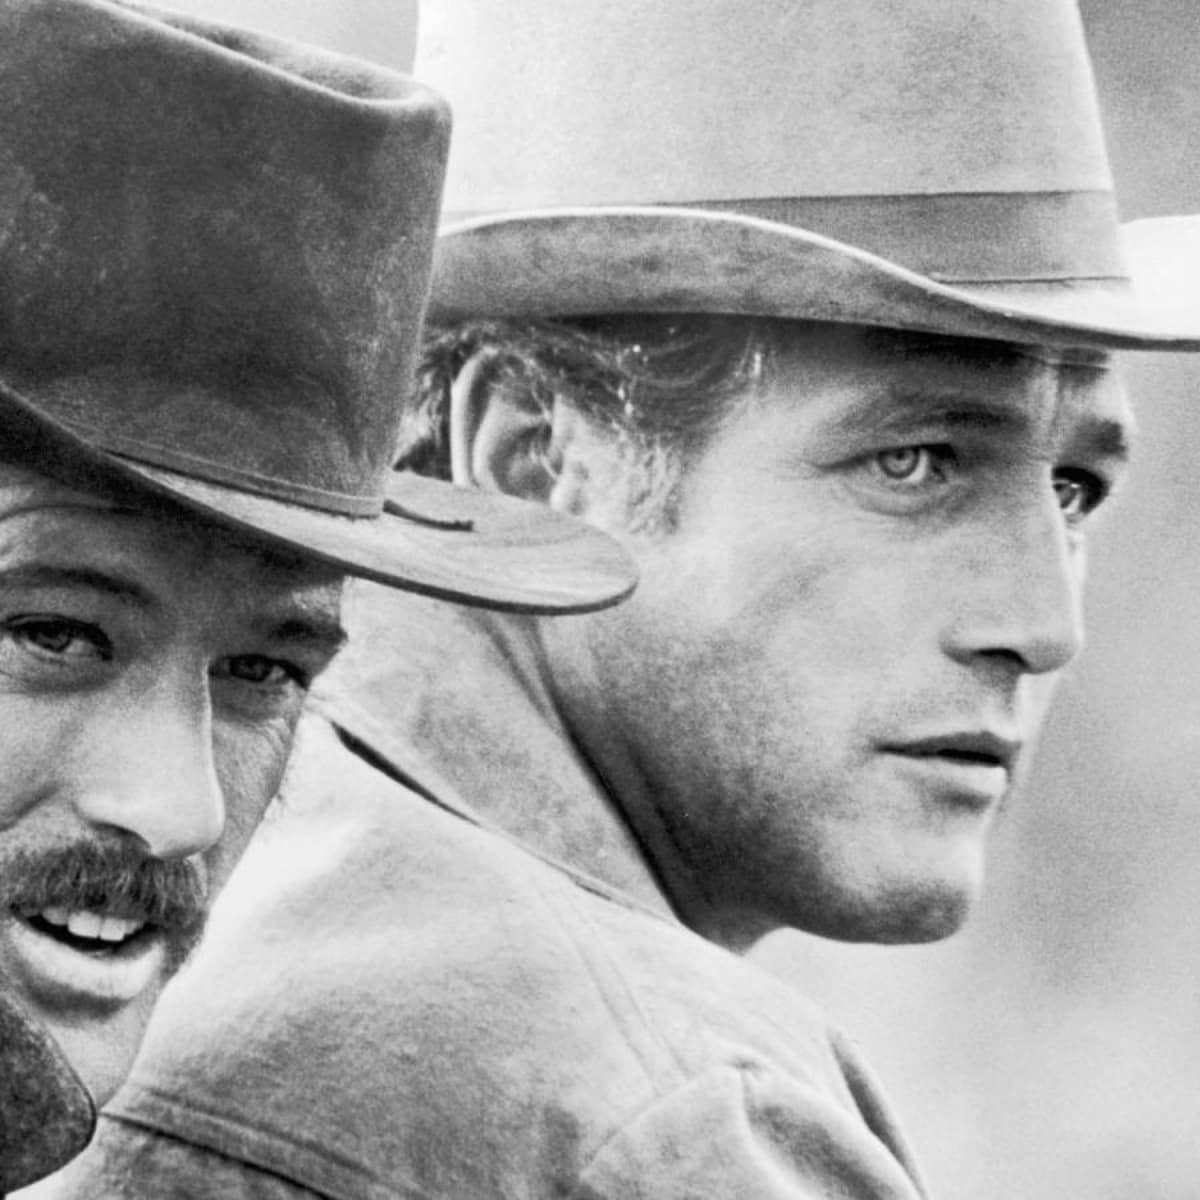 Houston Cinema Arts Festival, Butch Cassidy and the Sundance Kid, Robert Redford, Paul Newman, November 2012